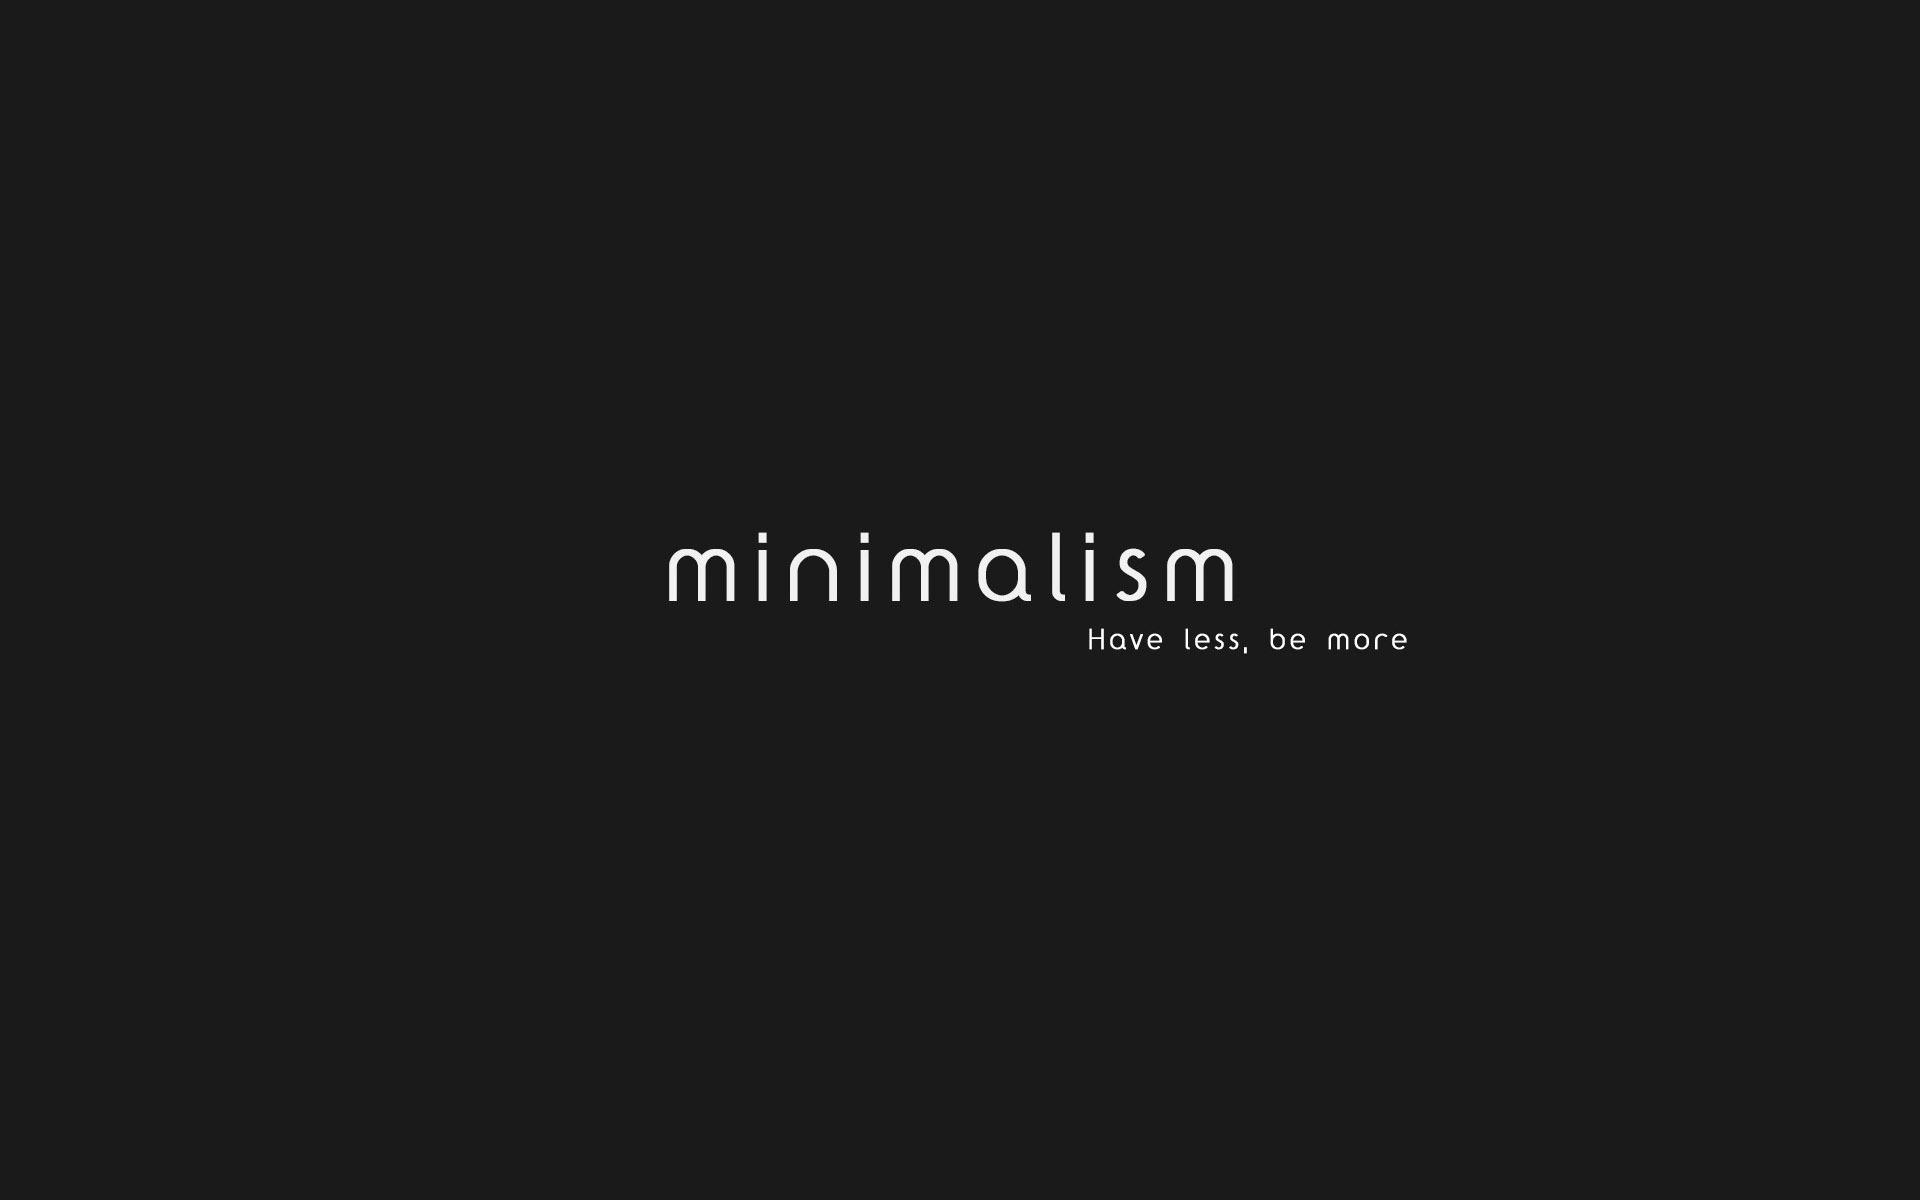 Minimalism - have less, be more - Amanda's Update